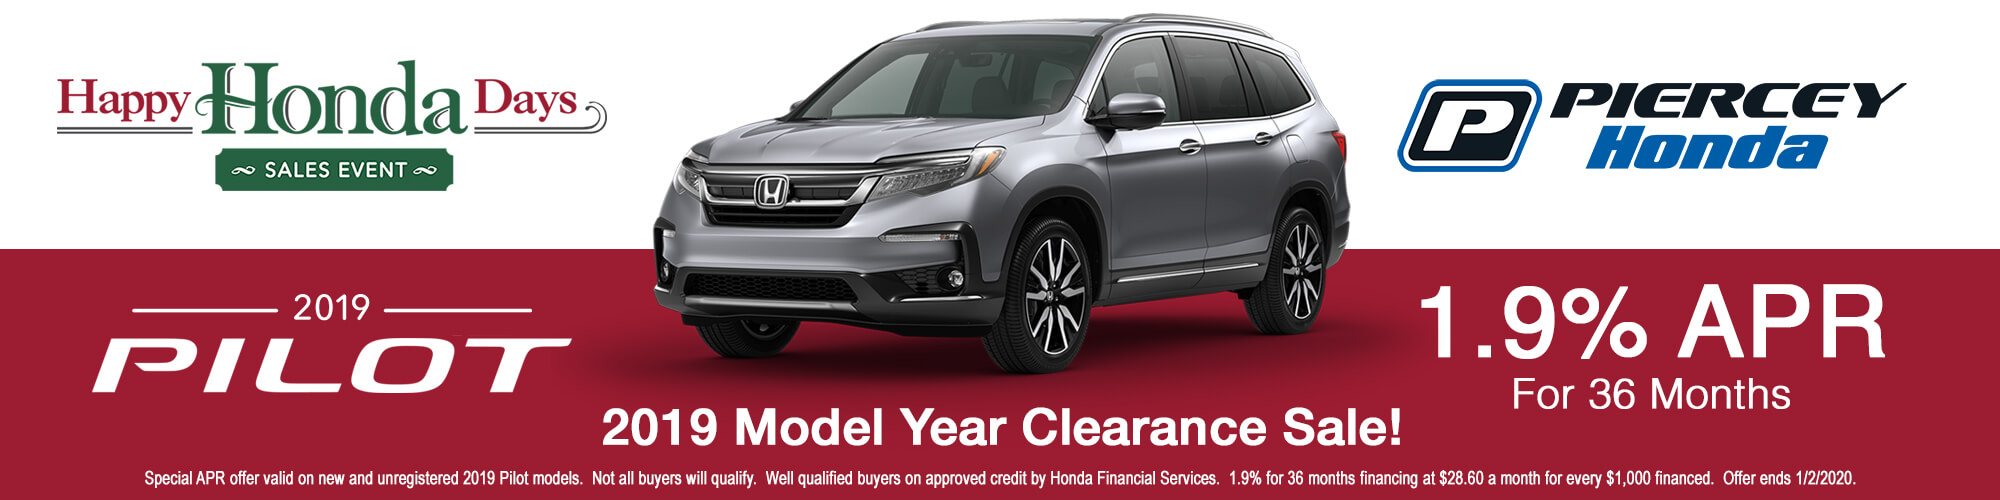 2019 Honda Pilot APR offer